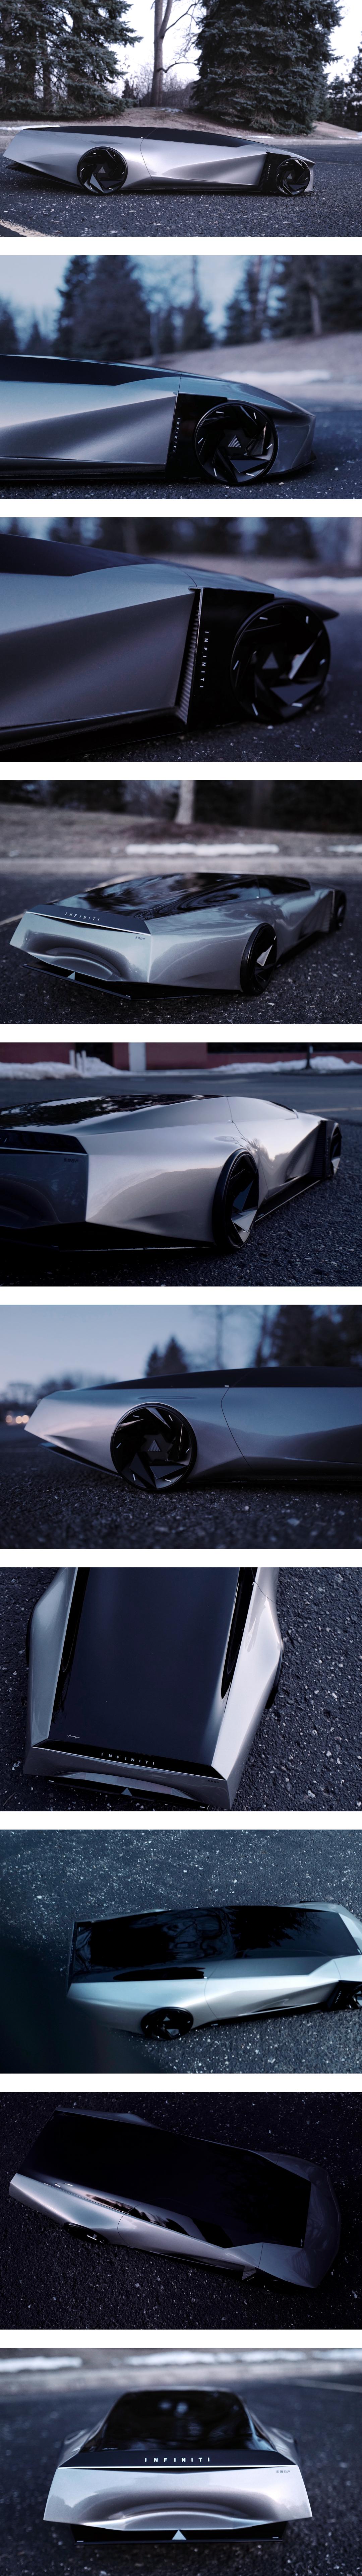 Product Design,Industrial Design,Automotive Design